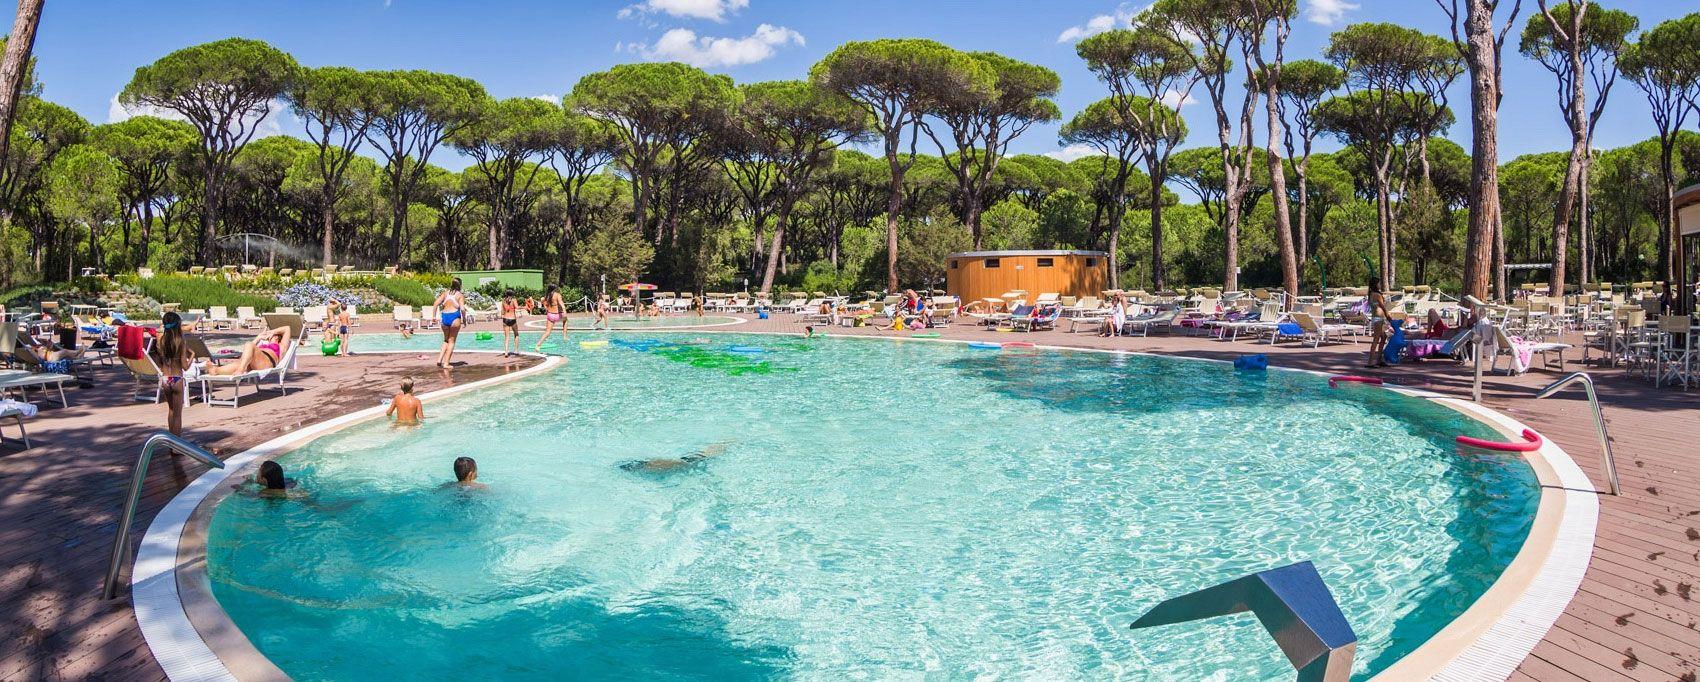 Cieloverde Village - Toscana